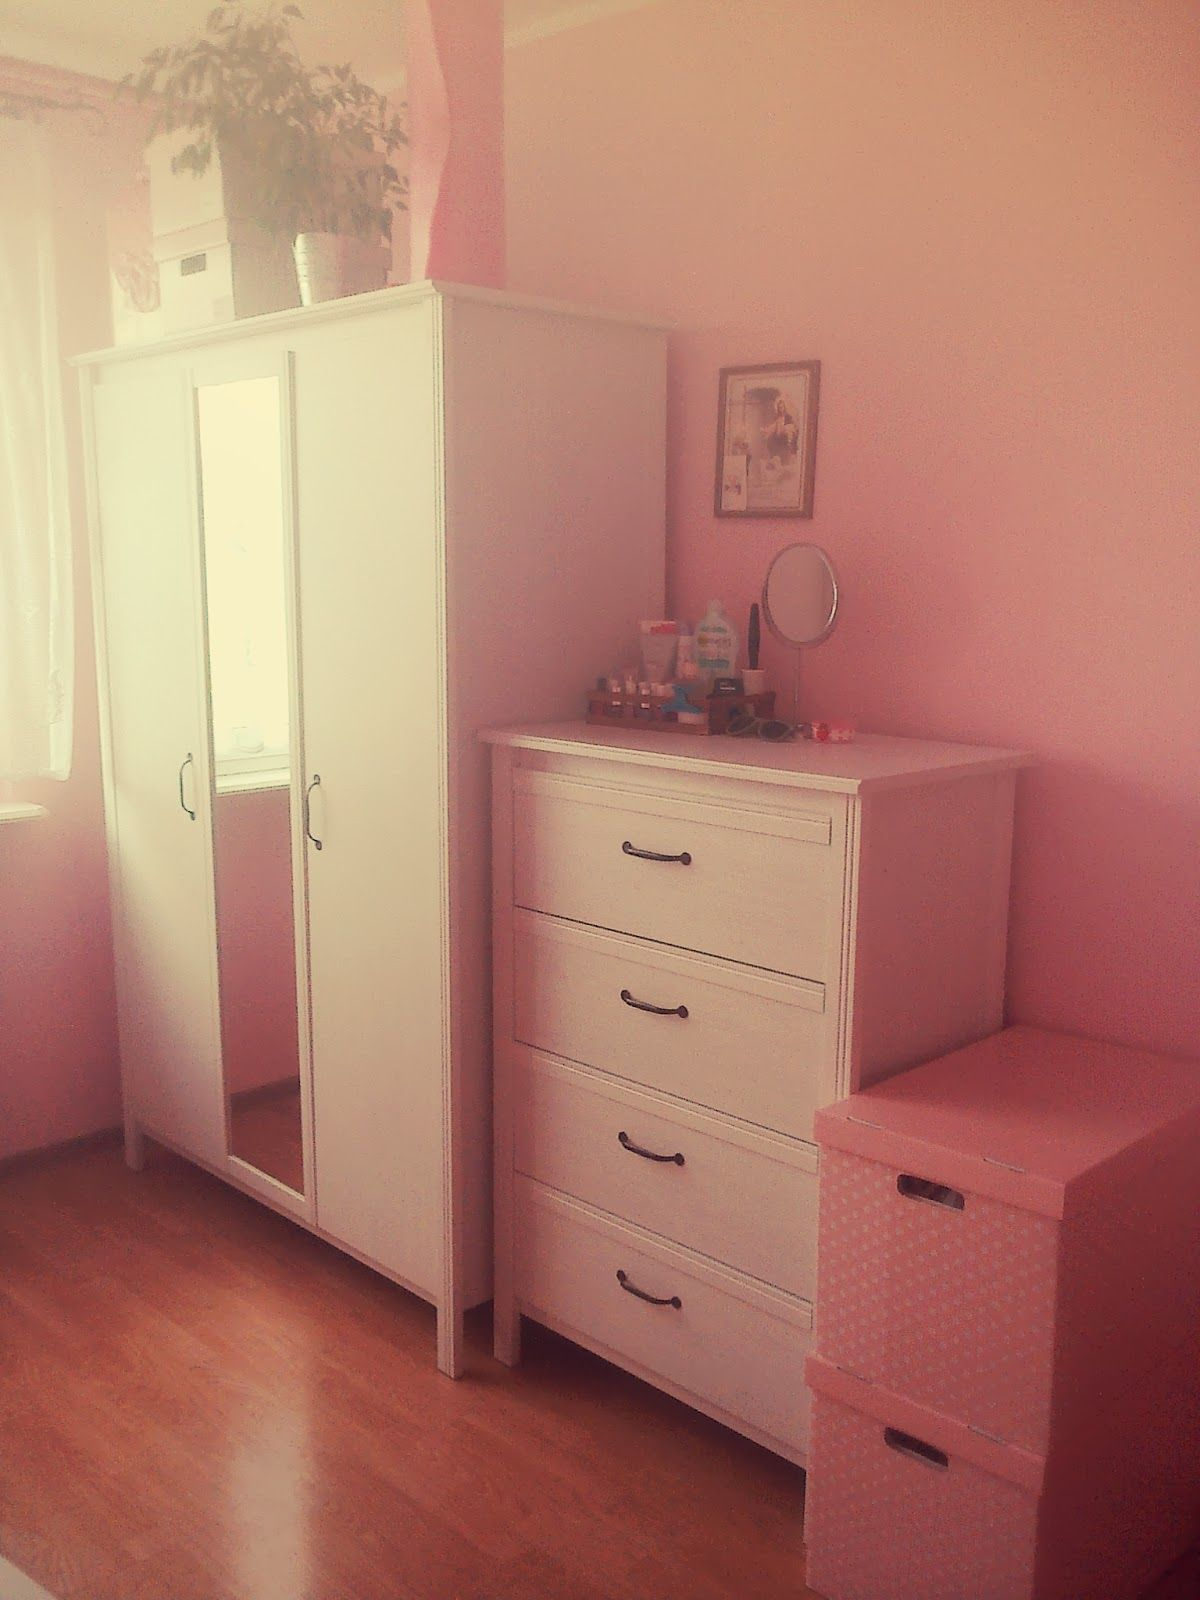 ikea brusali ikeafurniturespotting ikea furniture spotting pinterest bedrooms room and. Black Bedroom Furniture Sets. Home Design Ideas